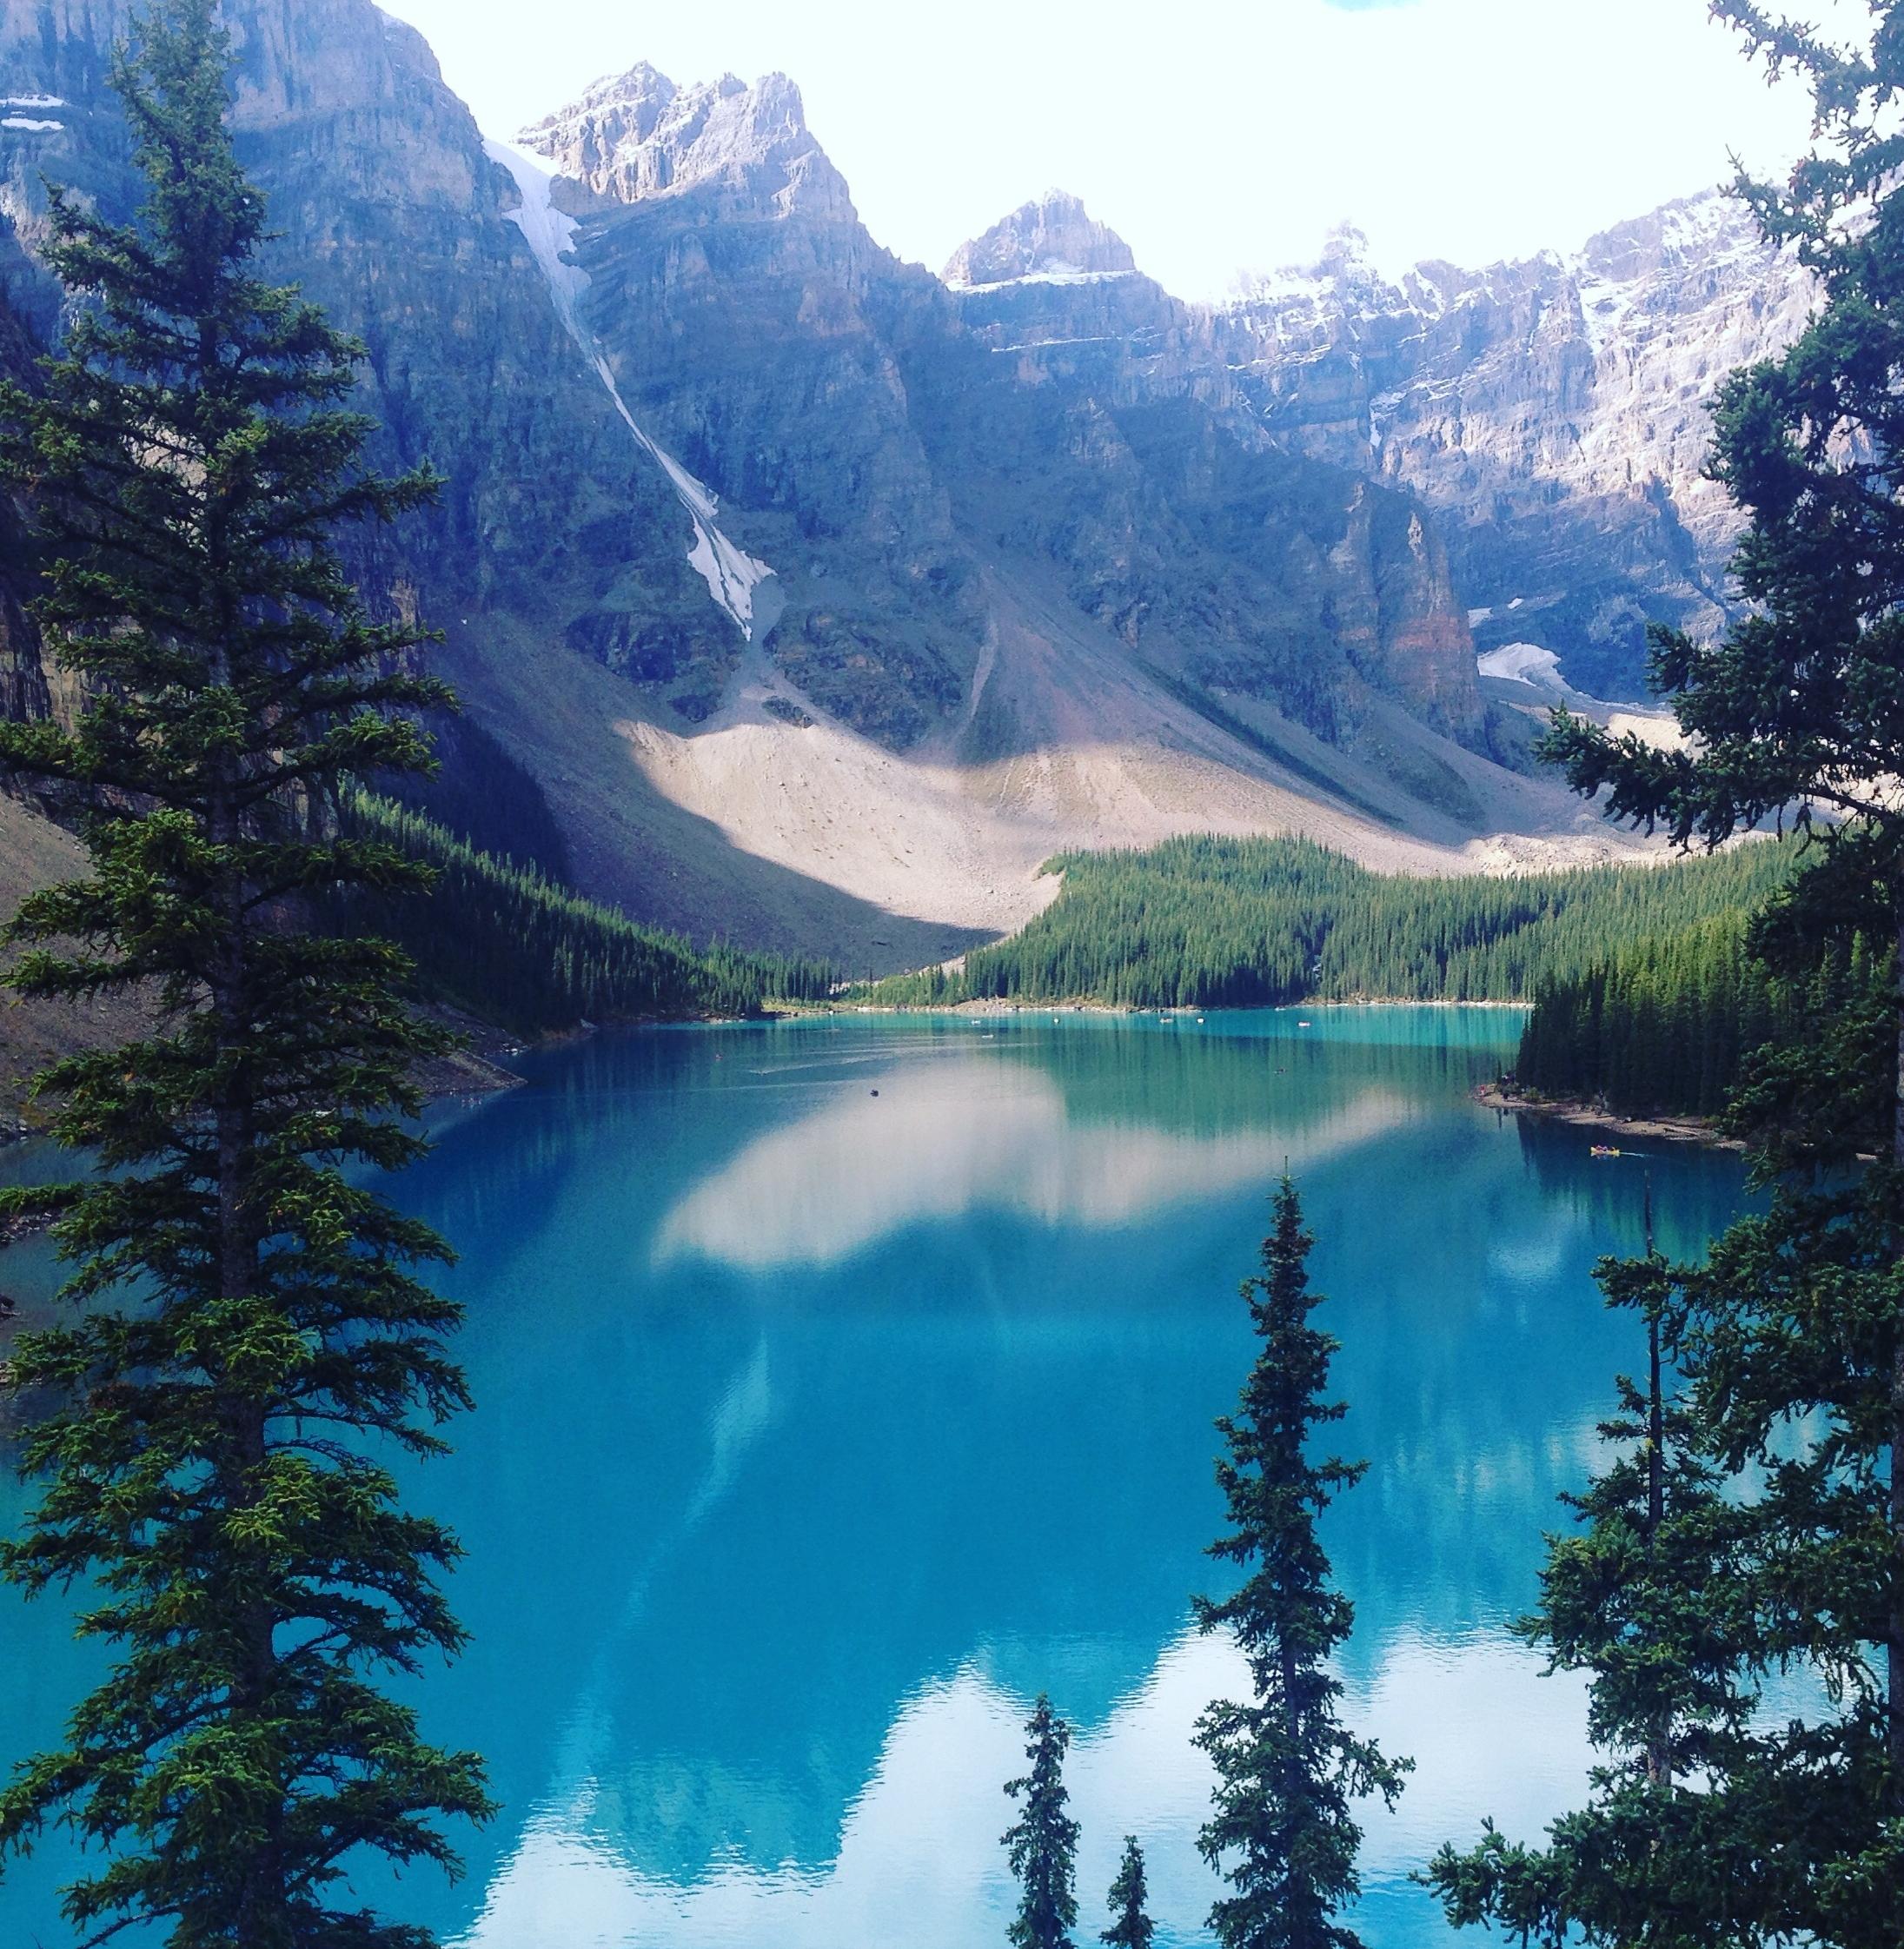 Moraine Lake, Alberta, Canada Photo by Dede Ranahan